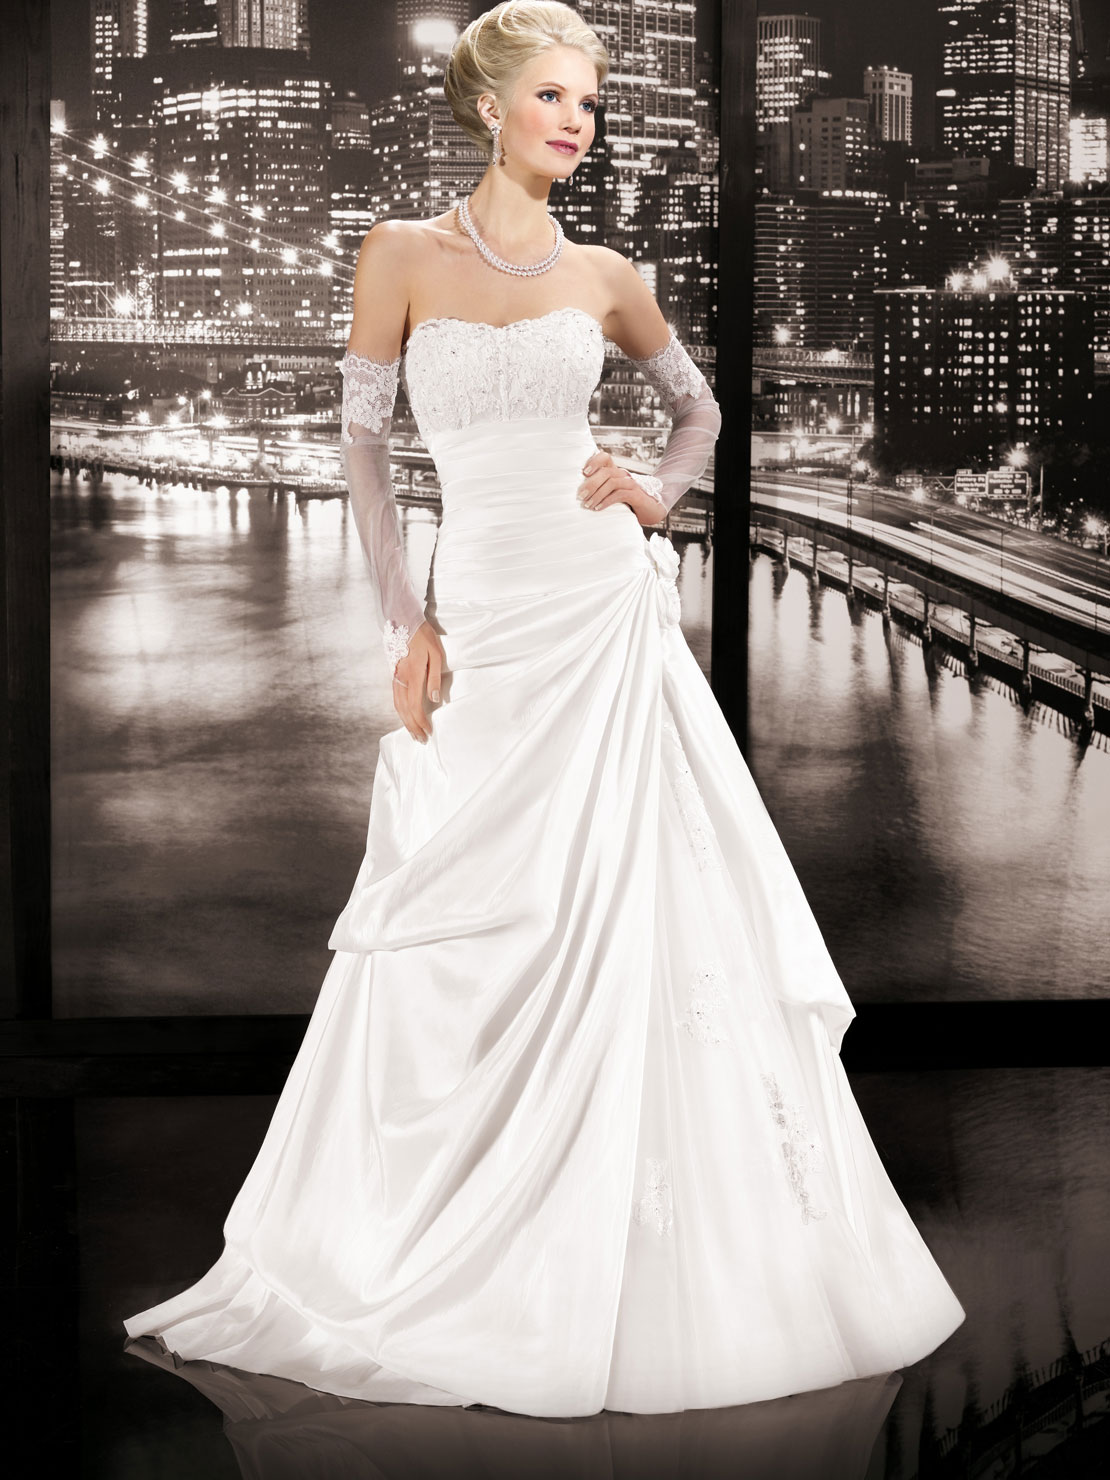 Tupelo Ms Prom Dresses - Homecoming Prom Dresses